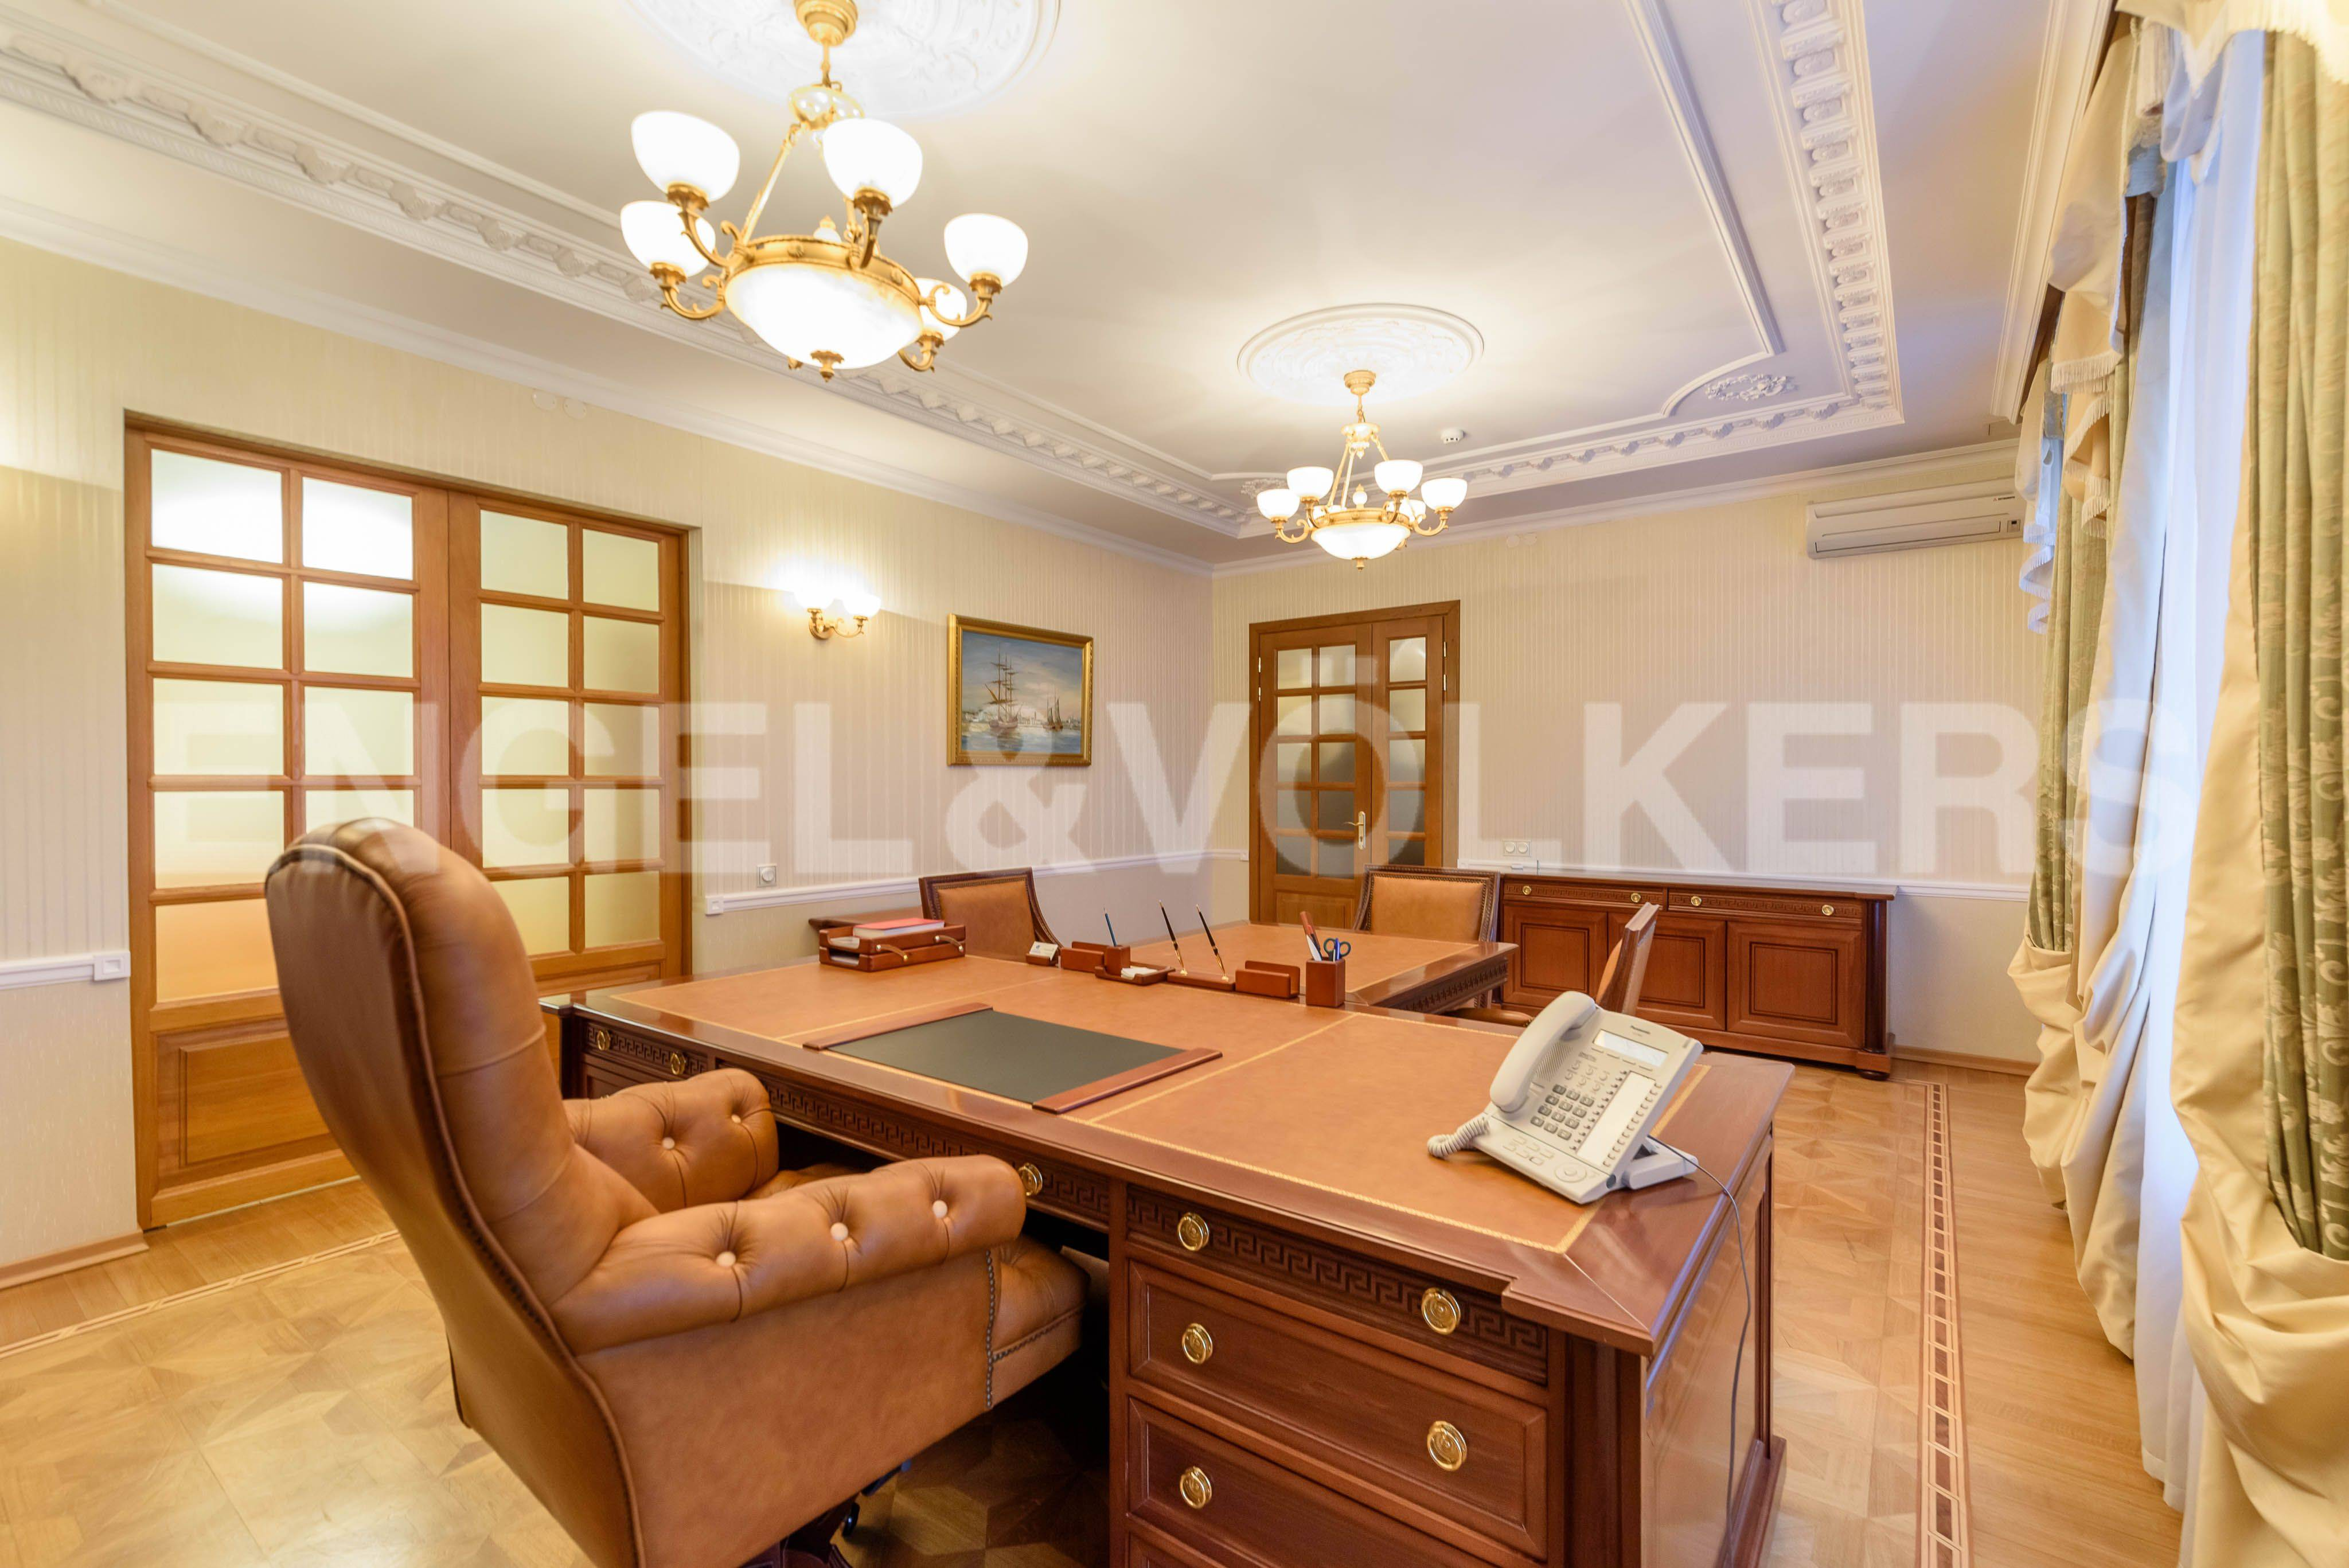 Элитные квартиры на . Санкт-Петербург, Динамо,24 . Интерьеры в классическом стиле